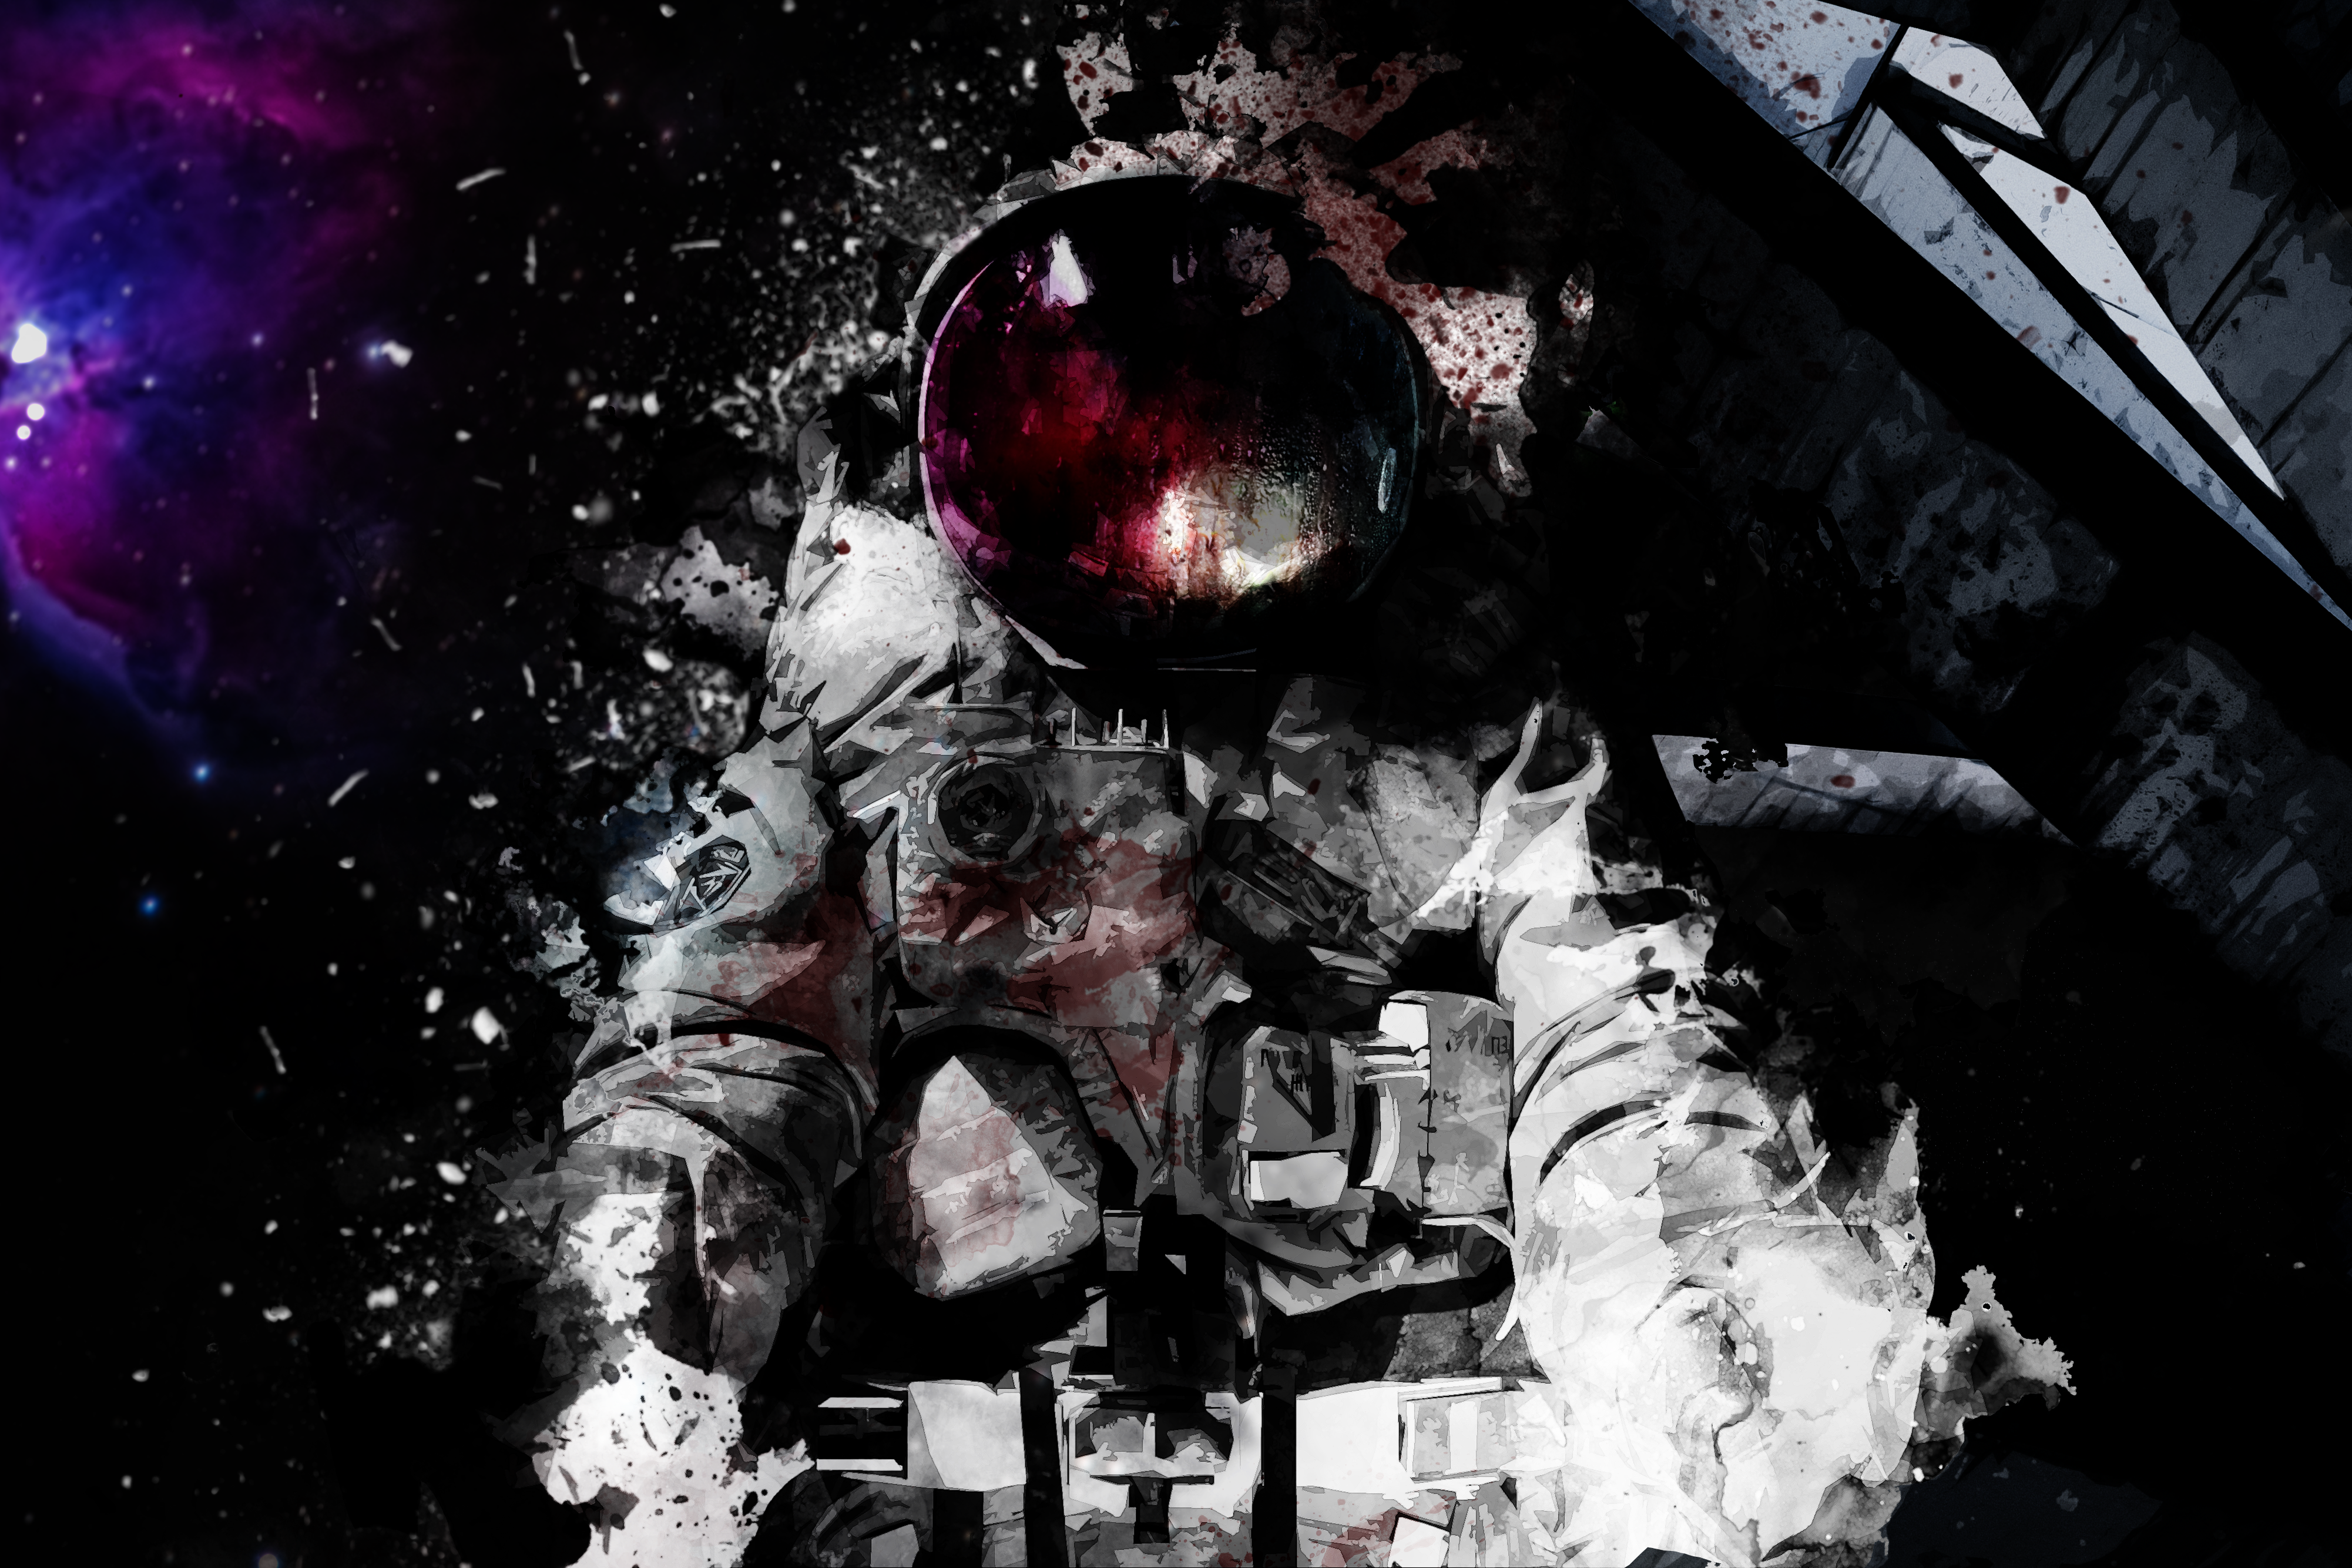 Astro-Soldier10